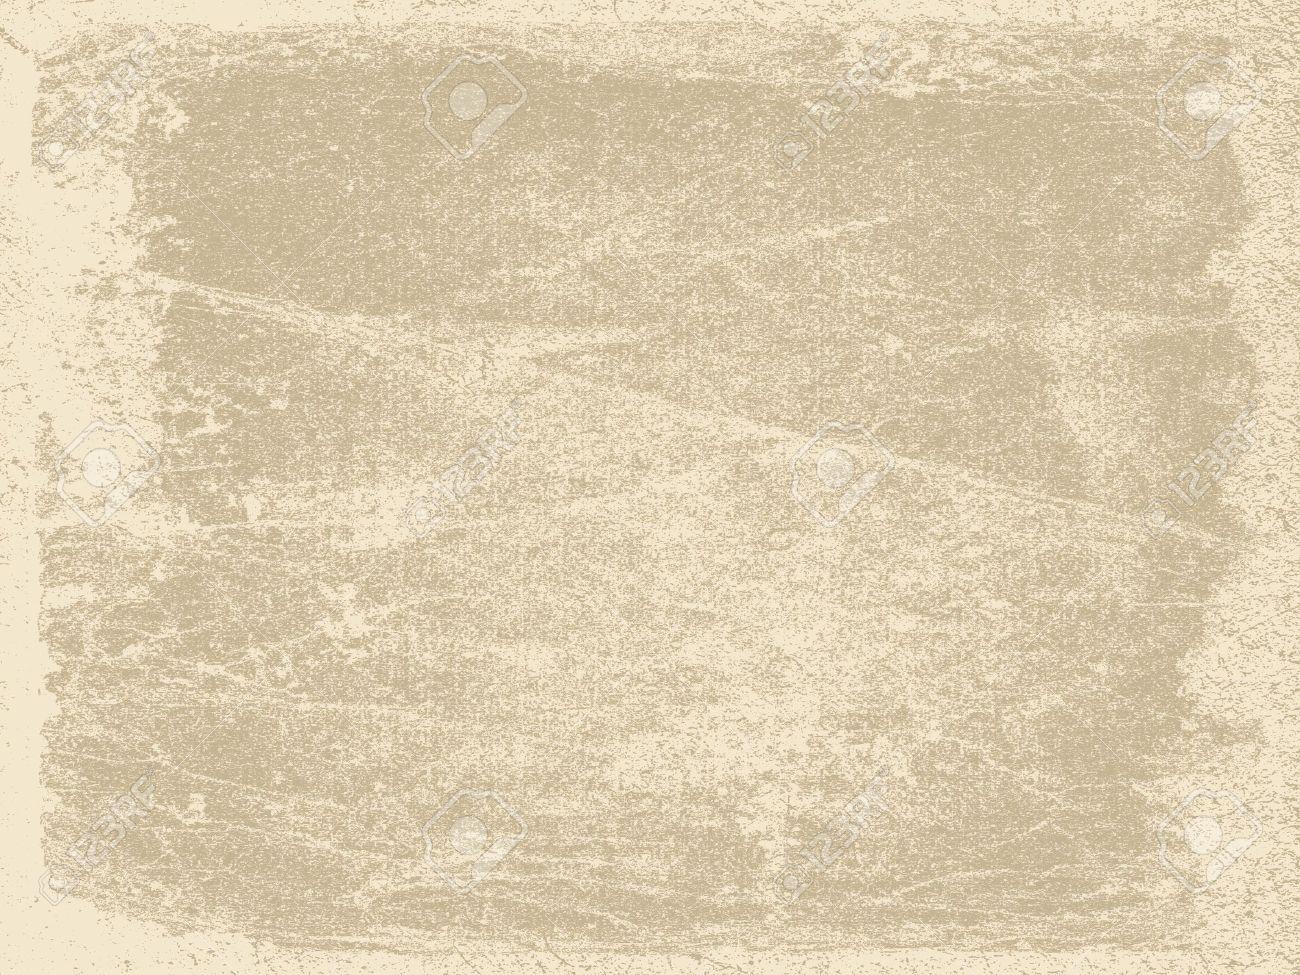 Paper texture clipart #17